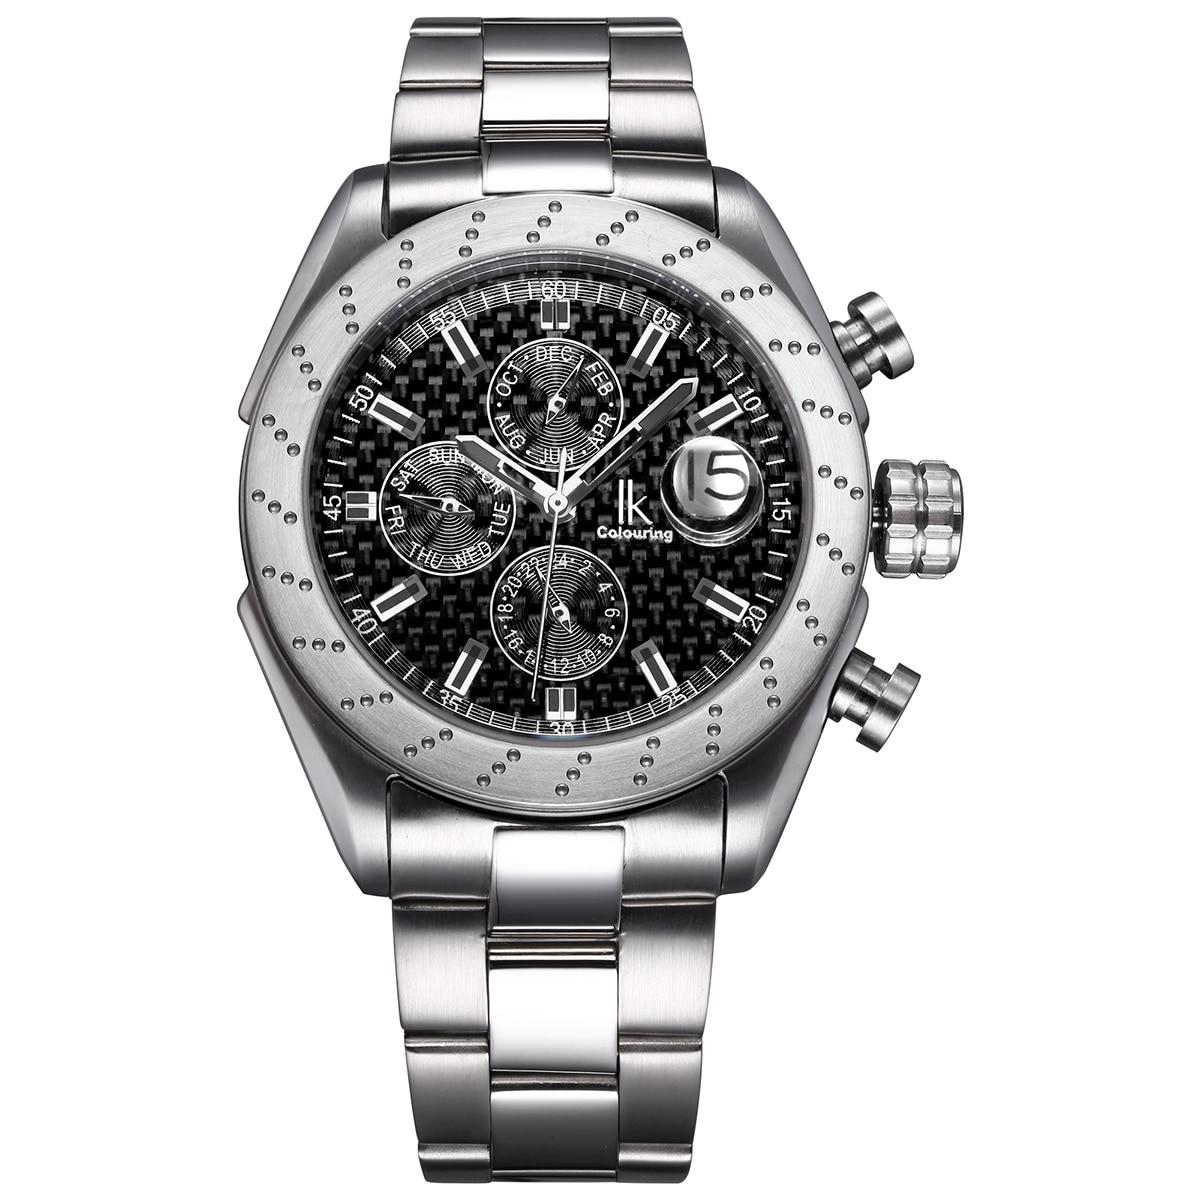 NewLuxury Menself-winding Watch Fashion Casual Stainless Steel Strap Multi-function Sports Waterproof Menwatch Relogio Feminino